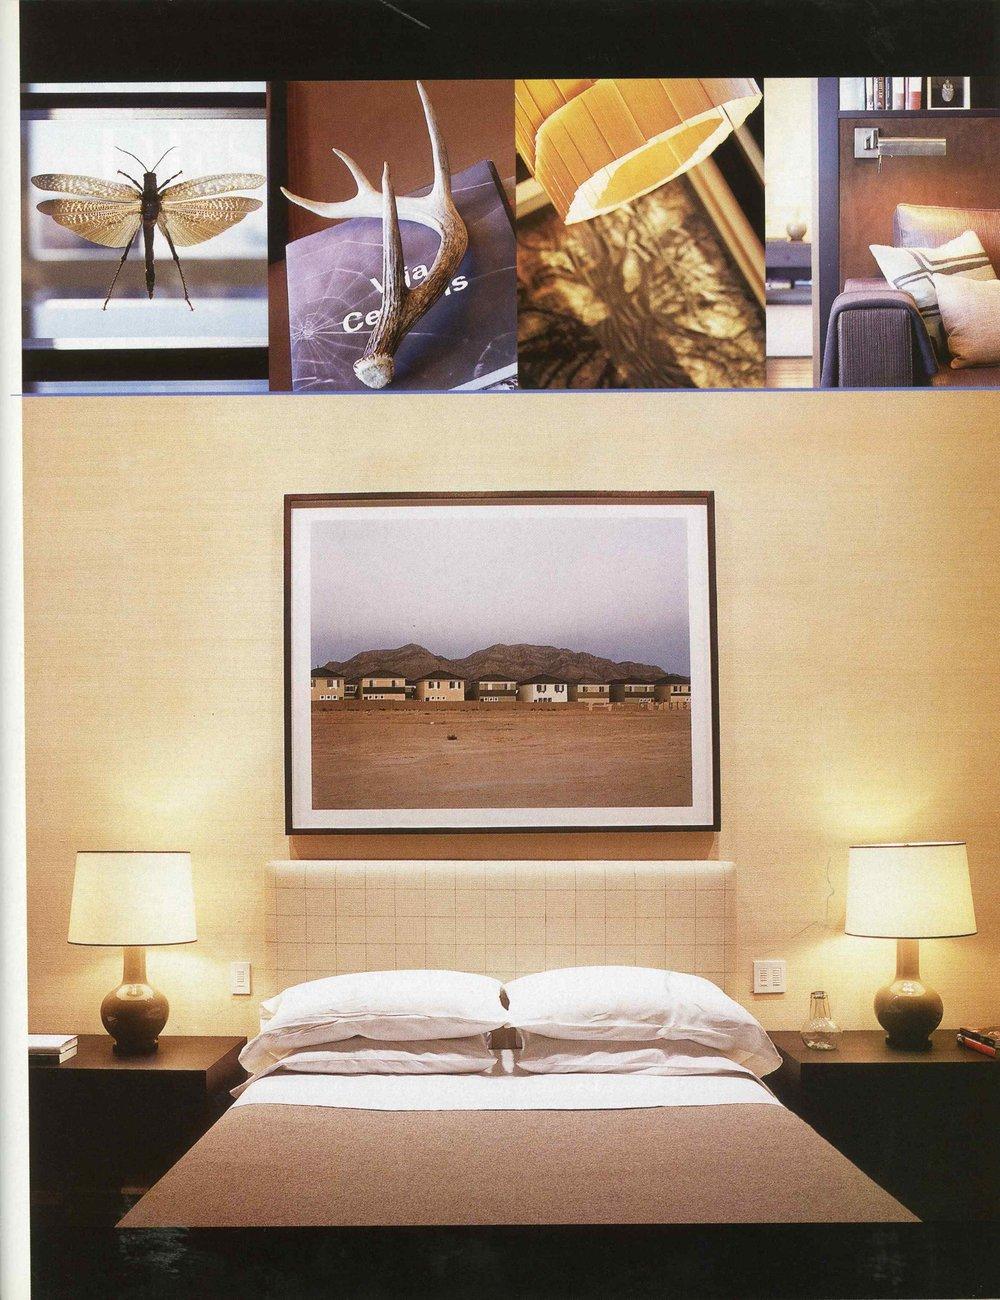 Interior Design_Jan 06_Full Article_Page_9.jpg